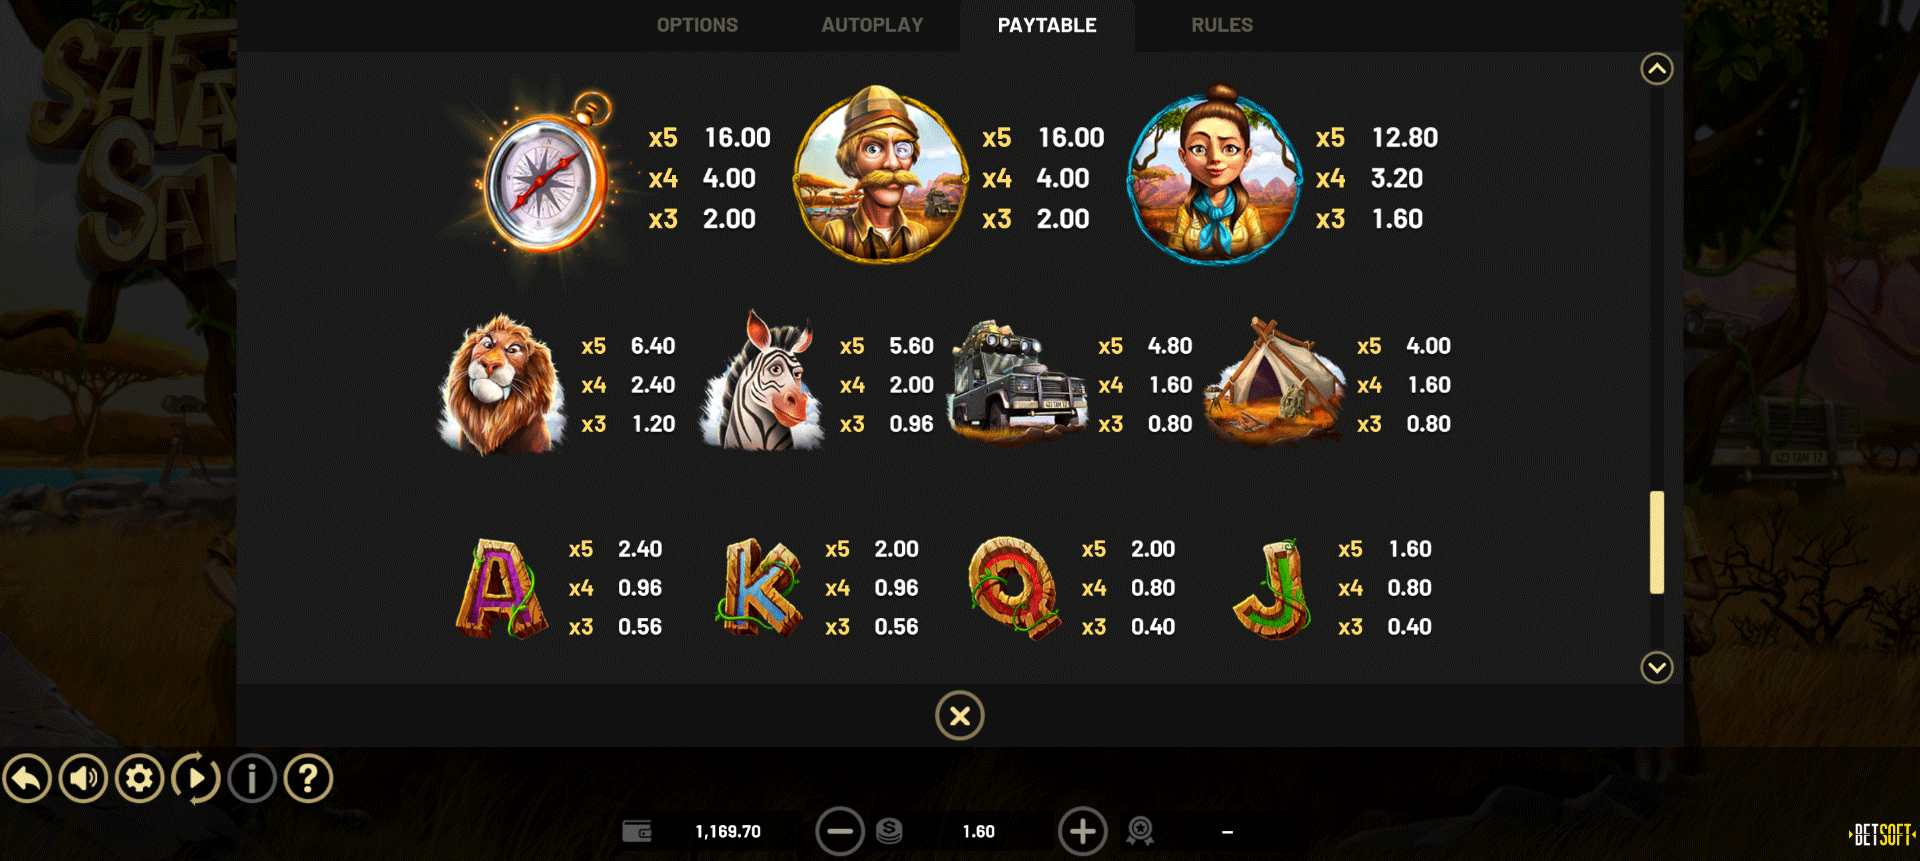 simboli del gioco slot online safari sam 2